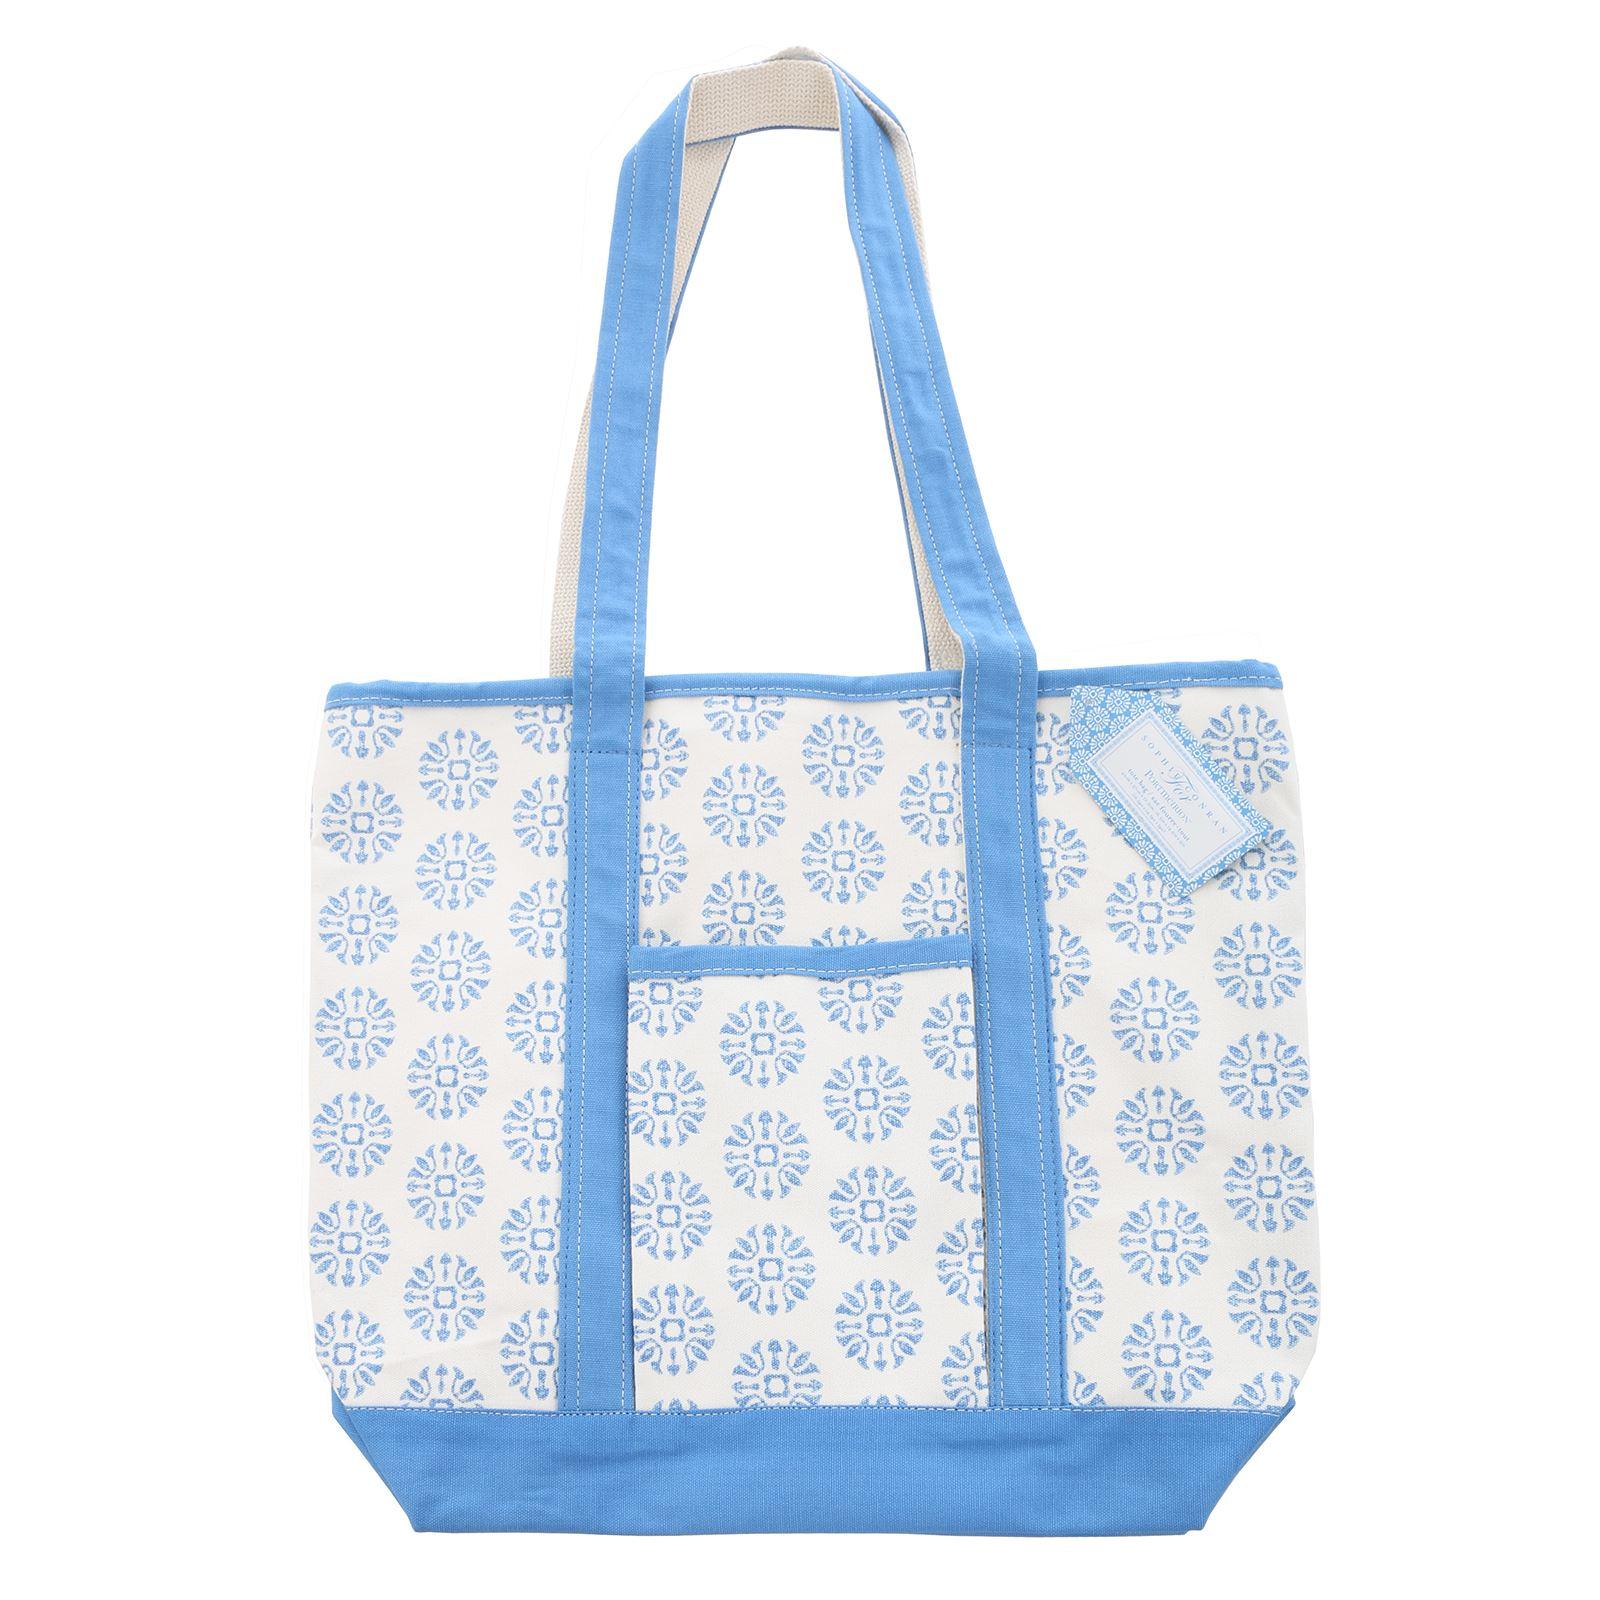 Details about Sophie Conran Womens Tote Bag Beach Shopper Poermerion Blue  White Cotton afcb6b59eb